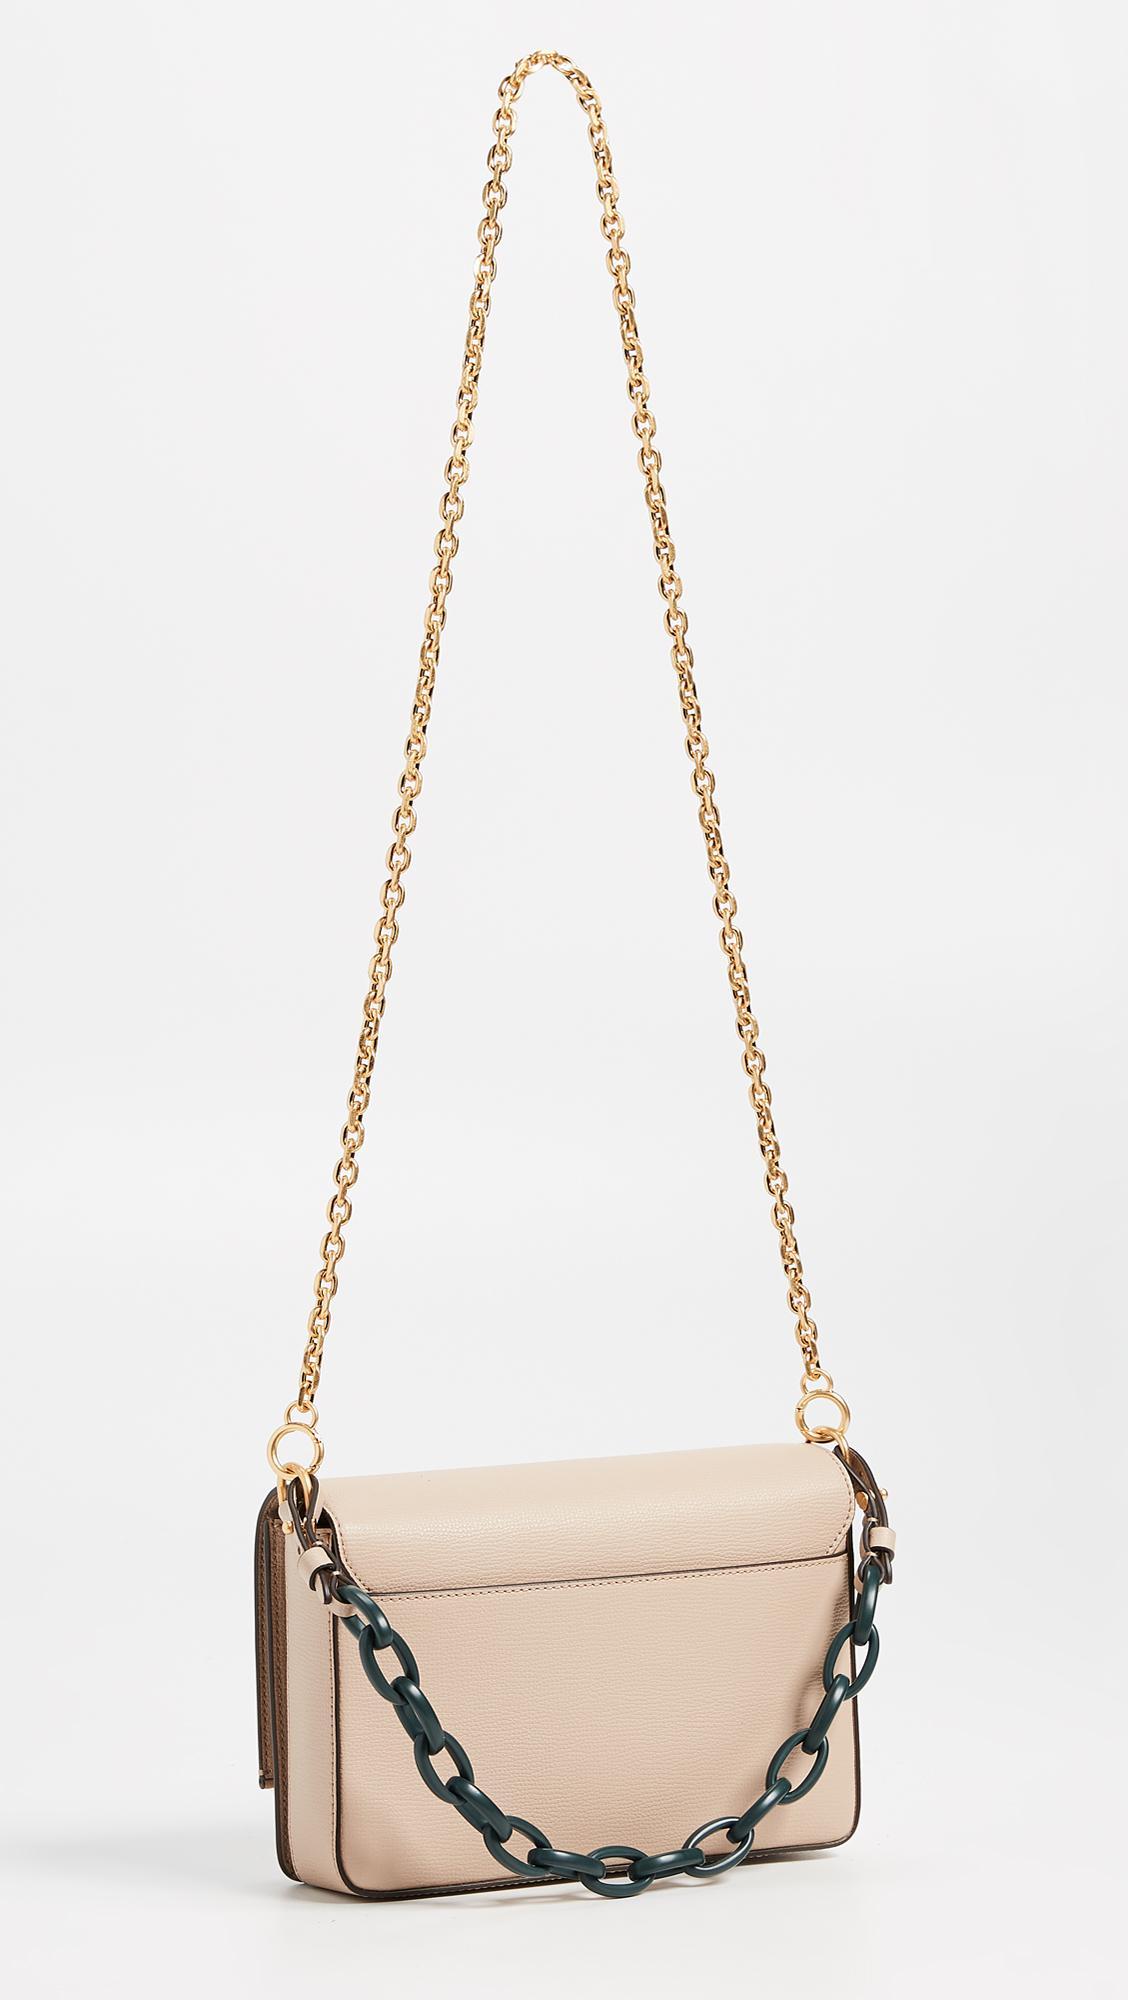 ddf6aaf8c7a8 Lyst - Tory Burch Kira Double Strap Shoulder Bag in Natural